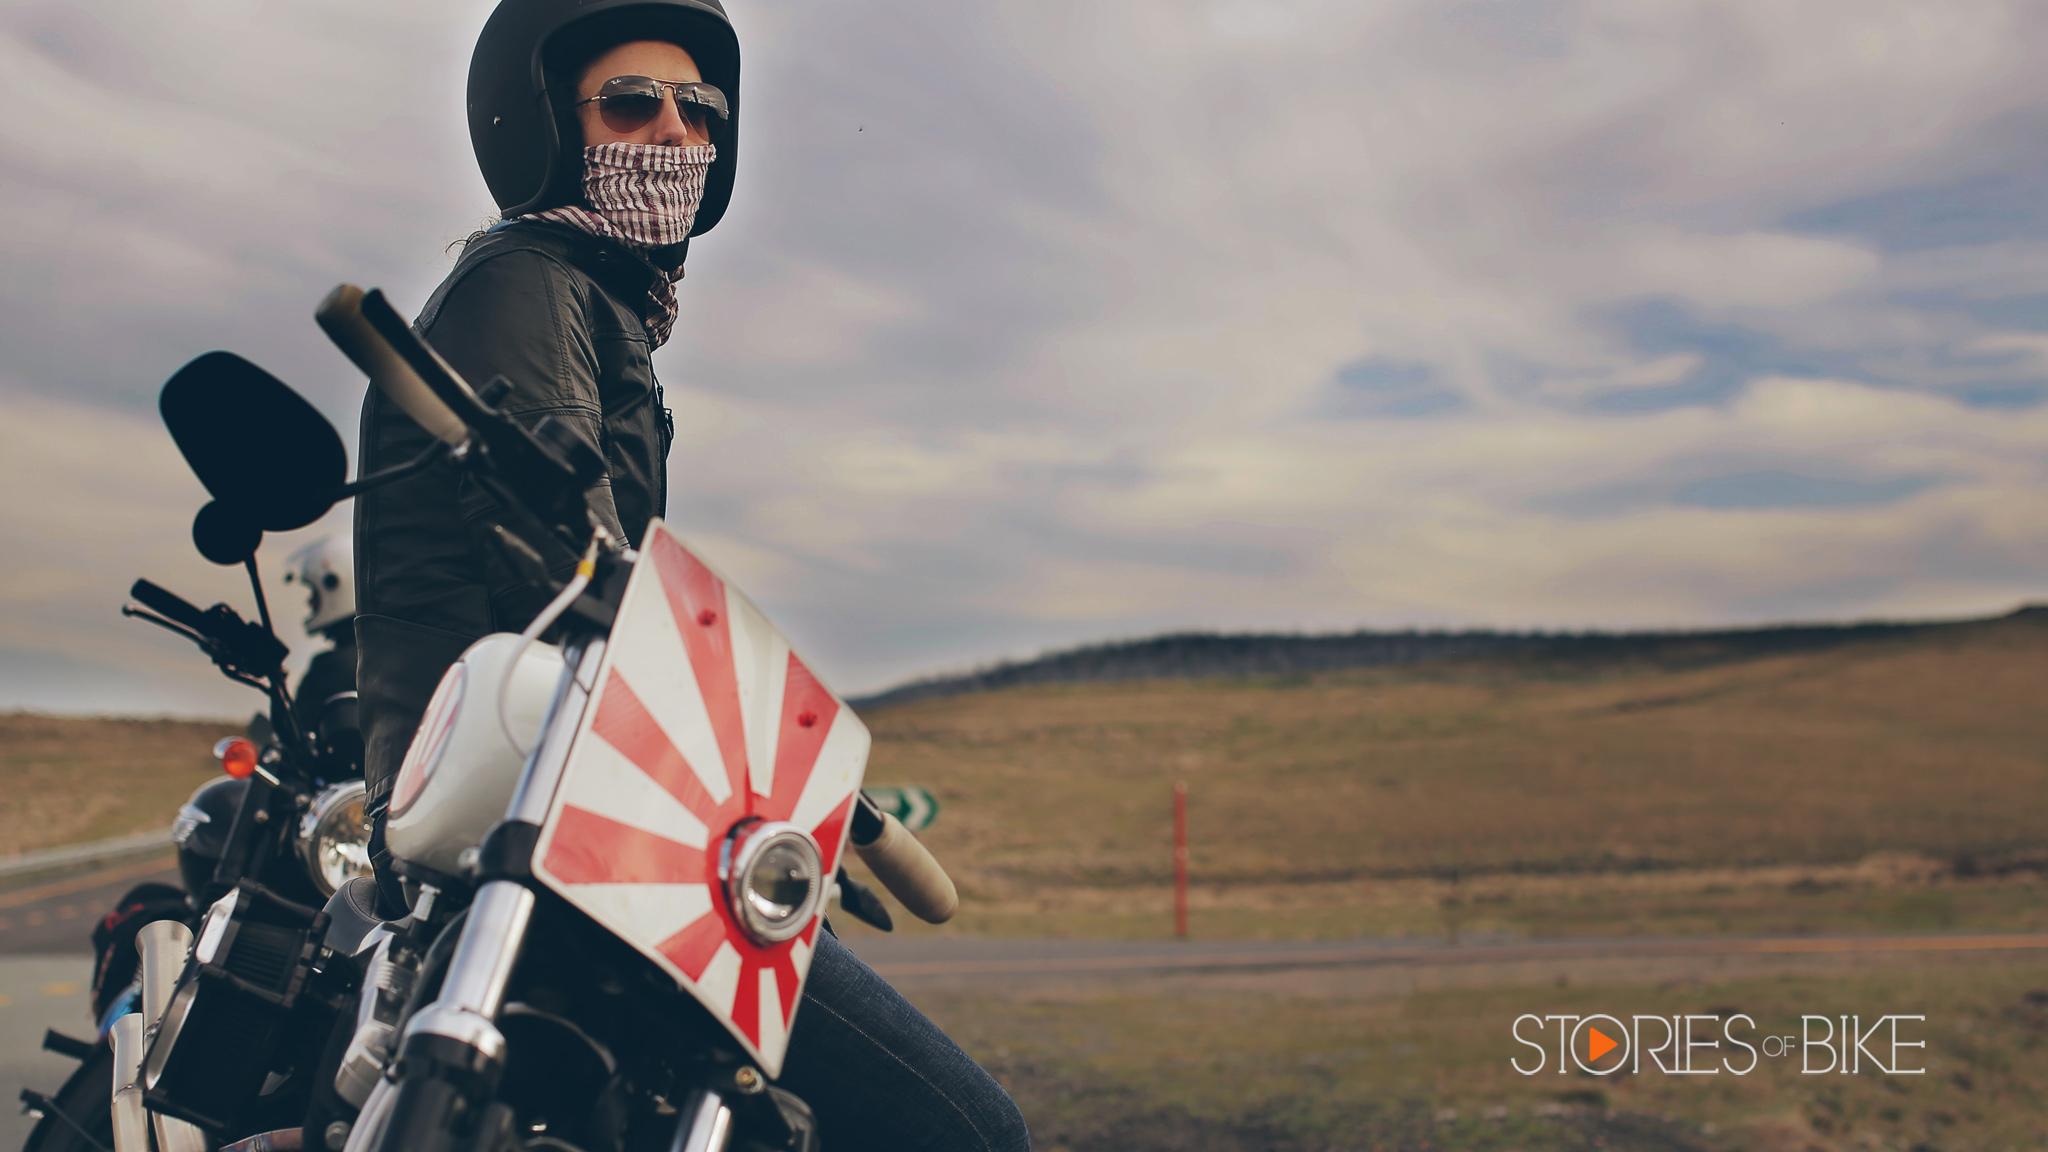 Stories_of_Bike_TwoCities_KK_Part3_7.jpg